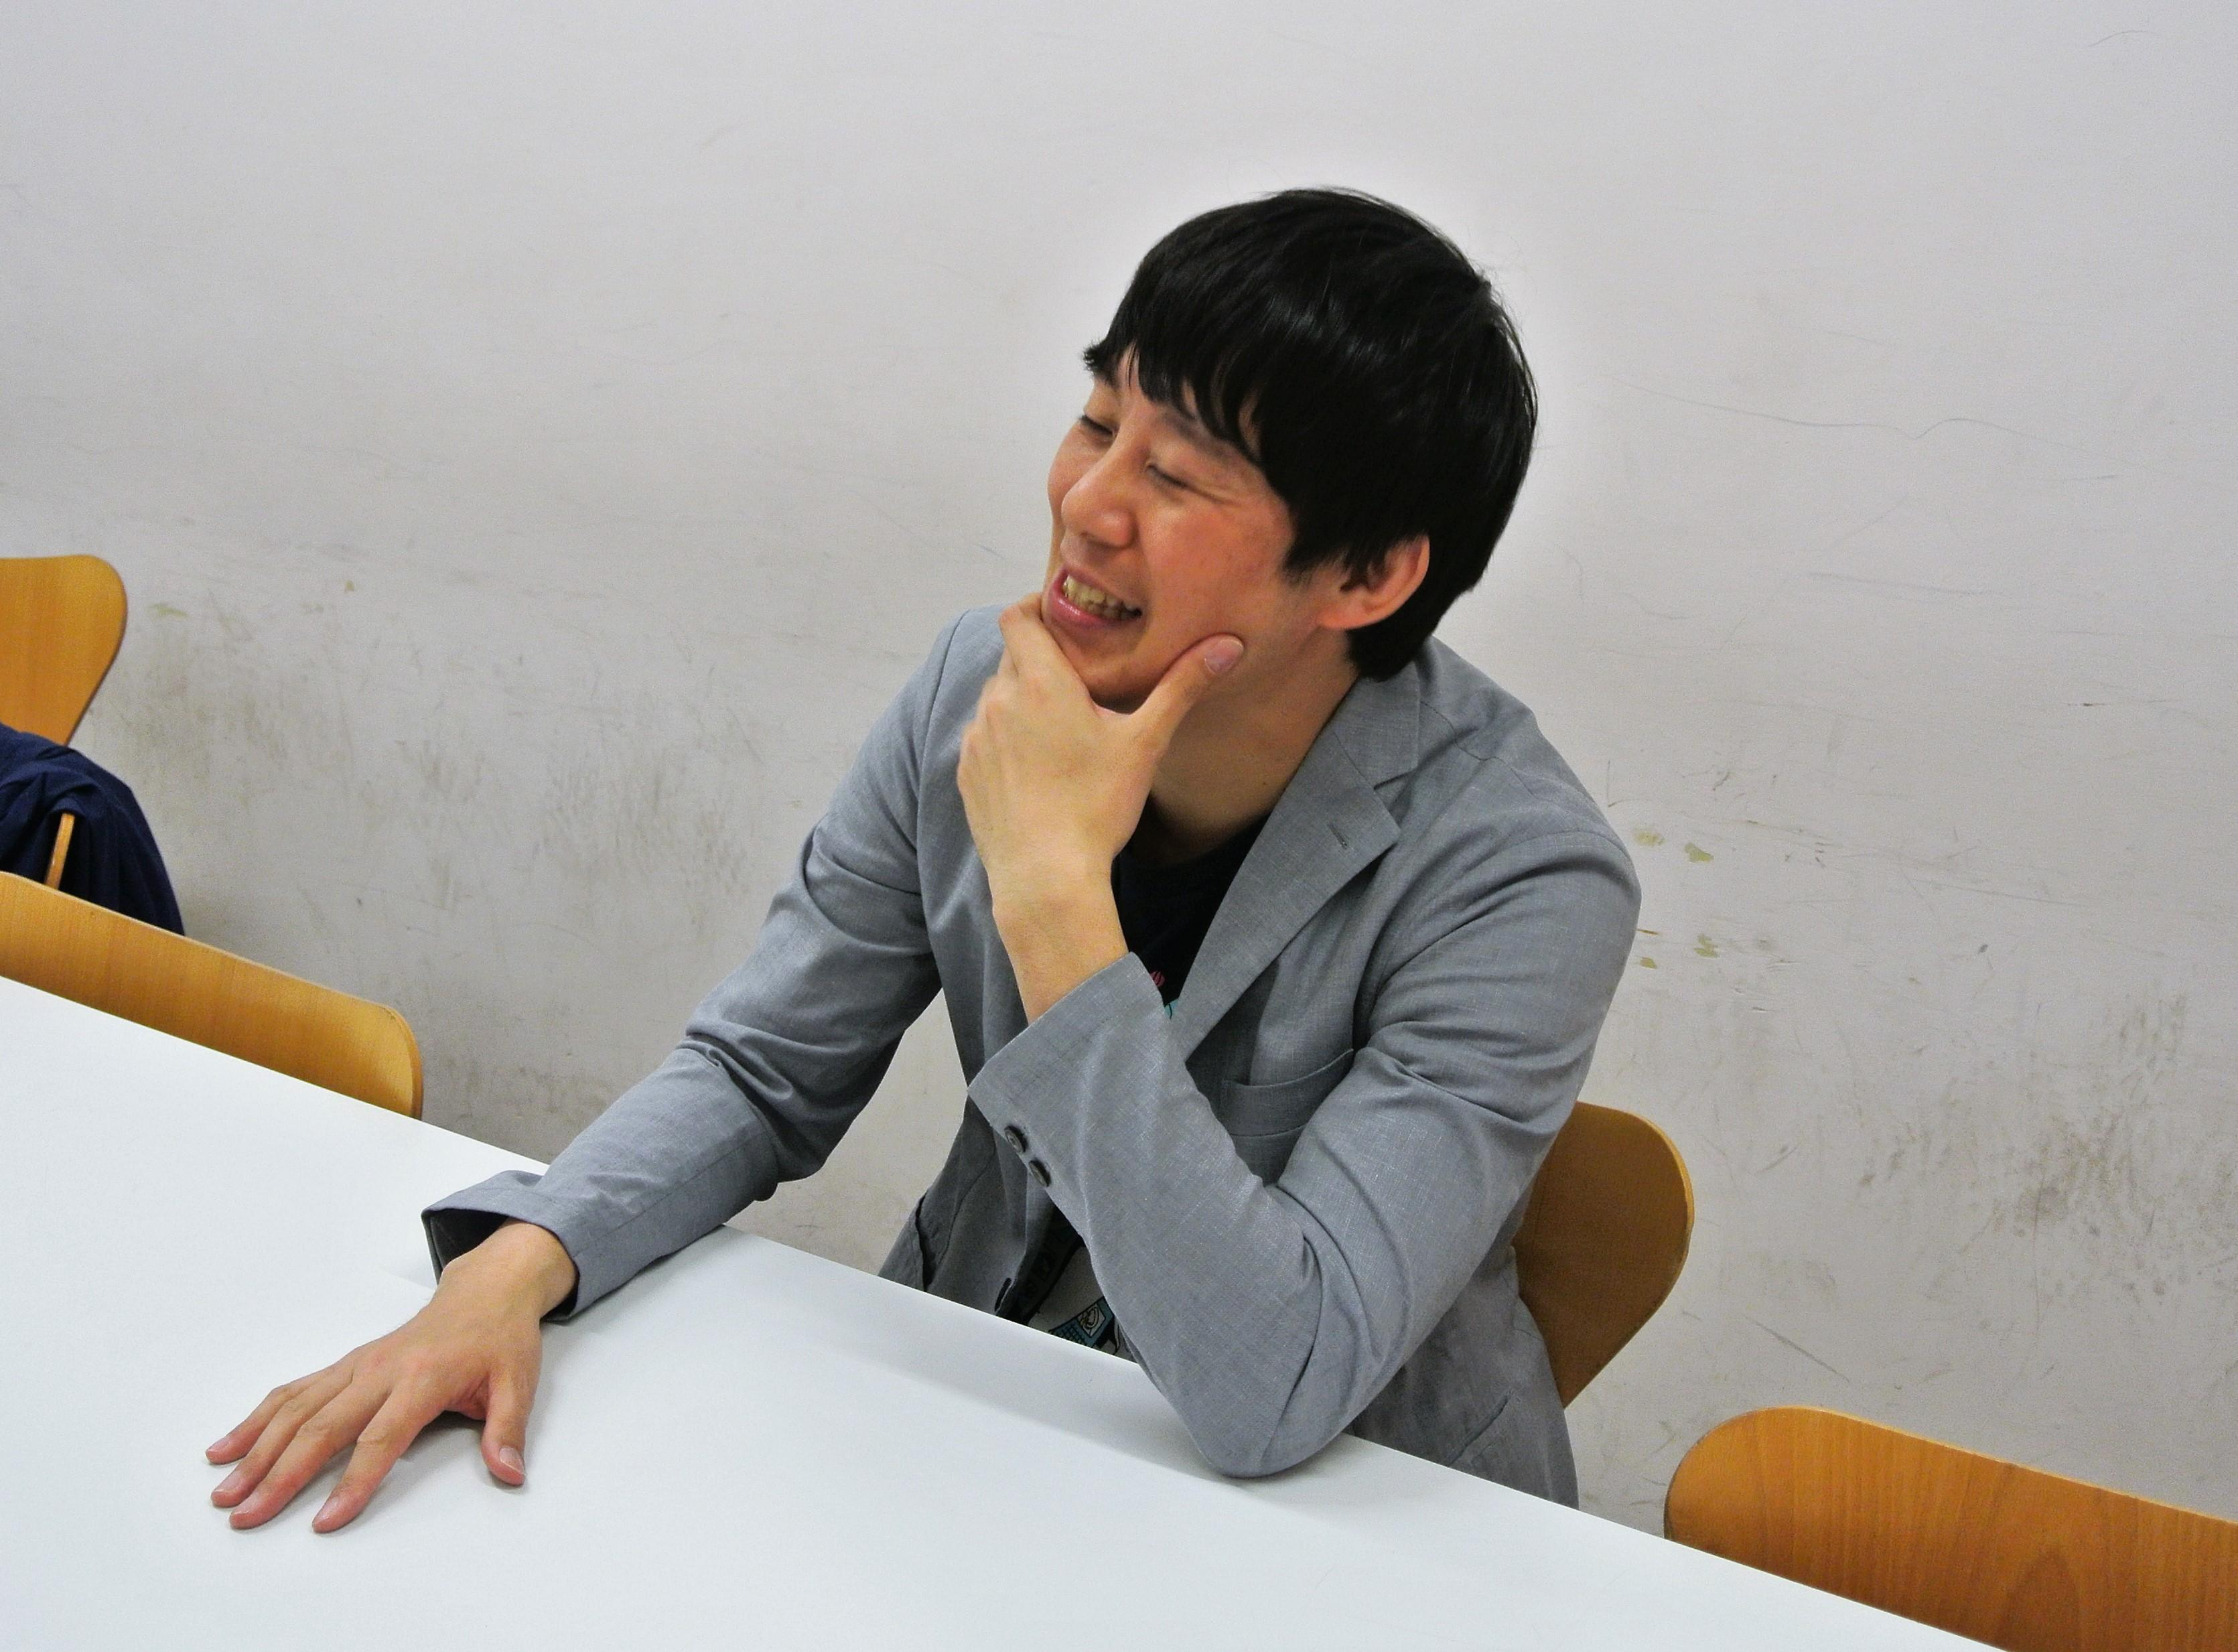 http://news.yoshimoto.co.jp/20170321195113-e83ca9d9f82853606347056b2dc284f6d0f00481.jpg